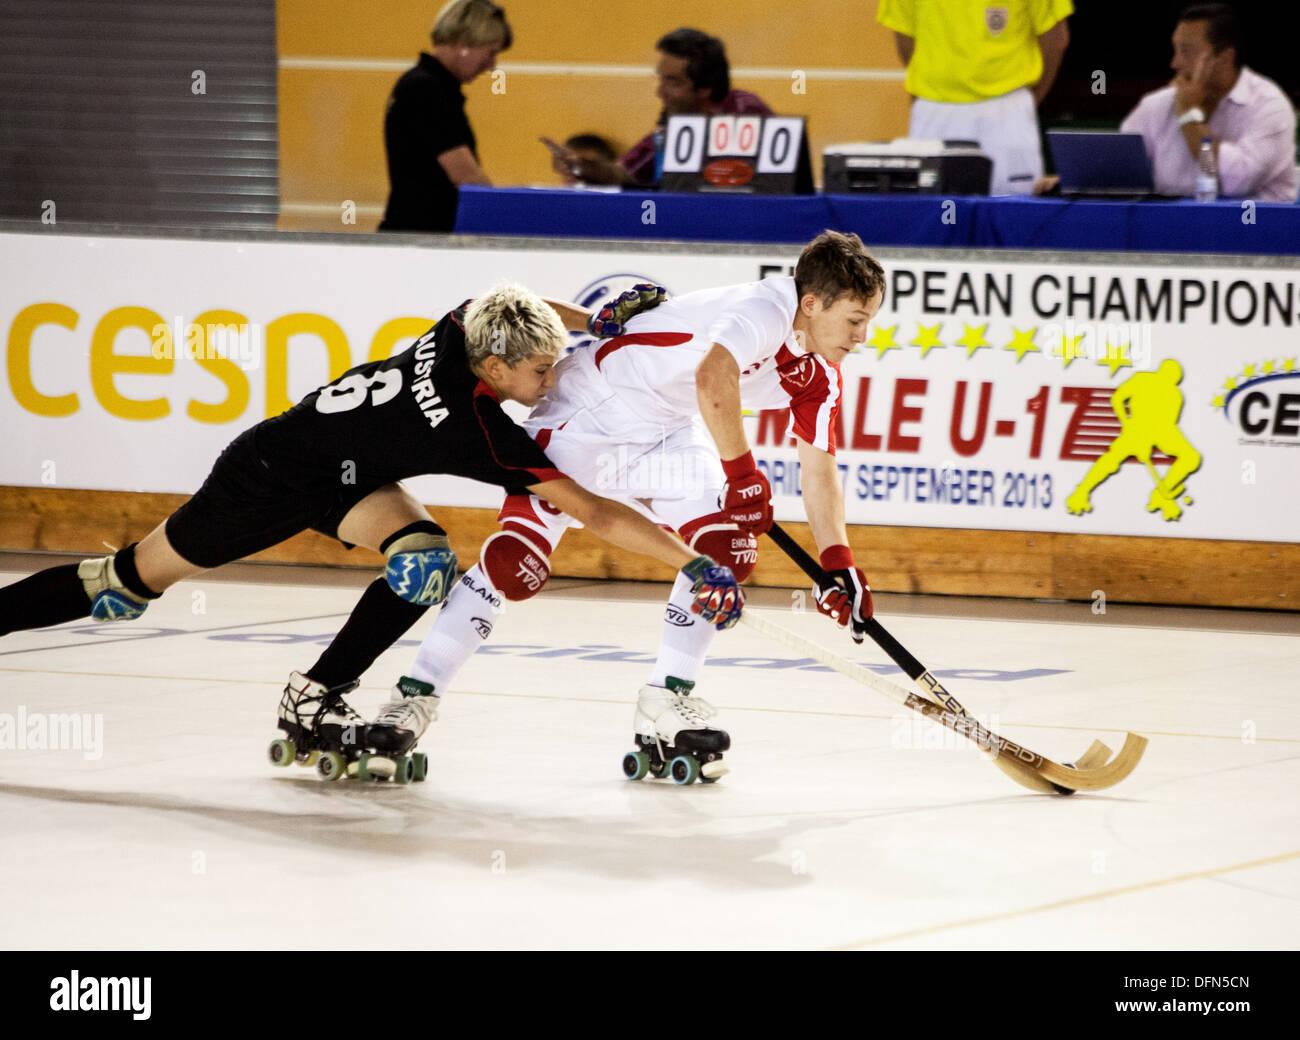 England v Austria U17 European Roller Hockey Championship, Madrid 2013 - Stock Image